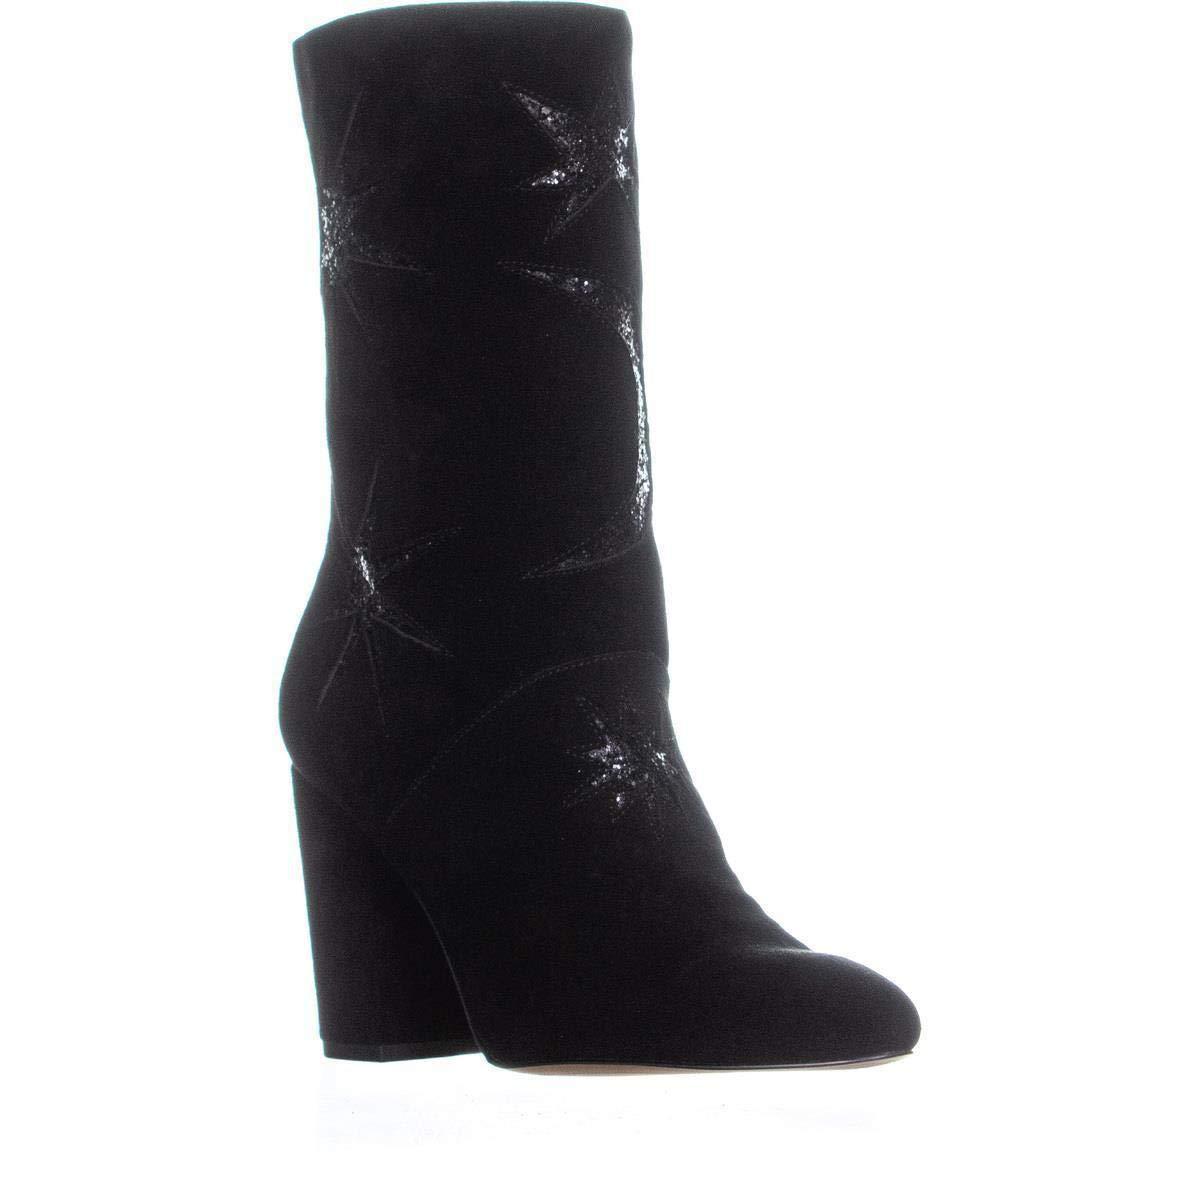 Black Suede Glitter Avec Les Filles Womens Nikita Suede Glitter Ankle Boots